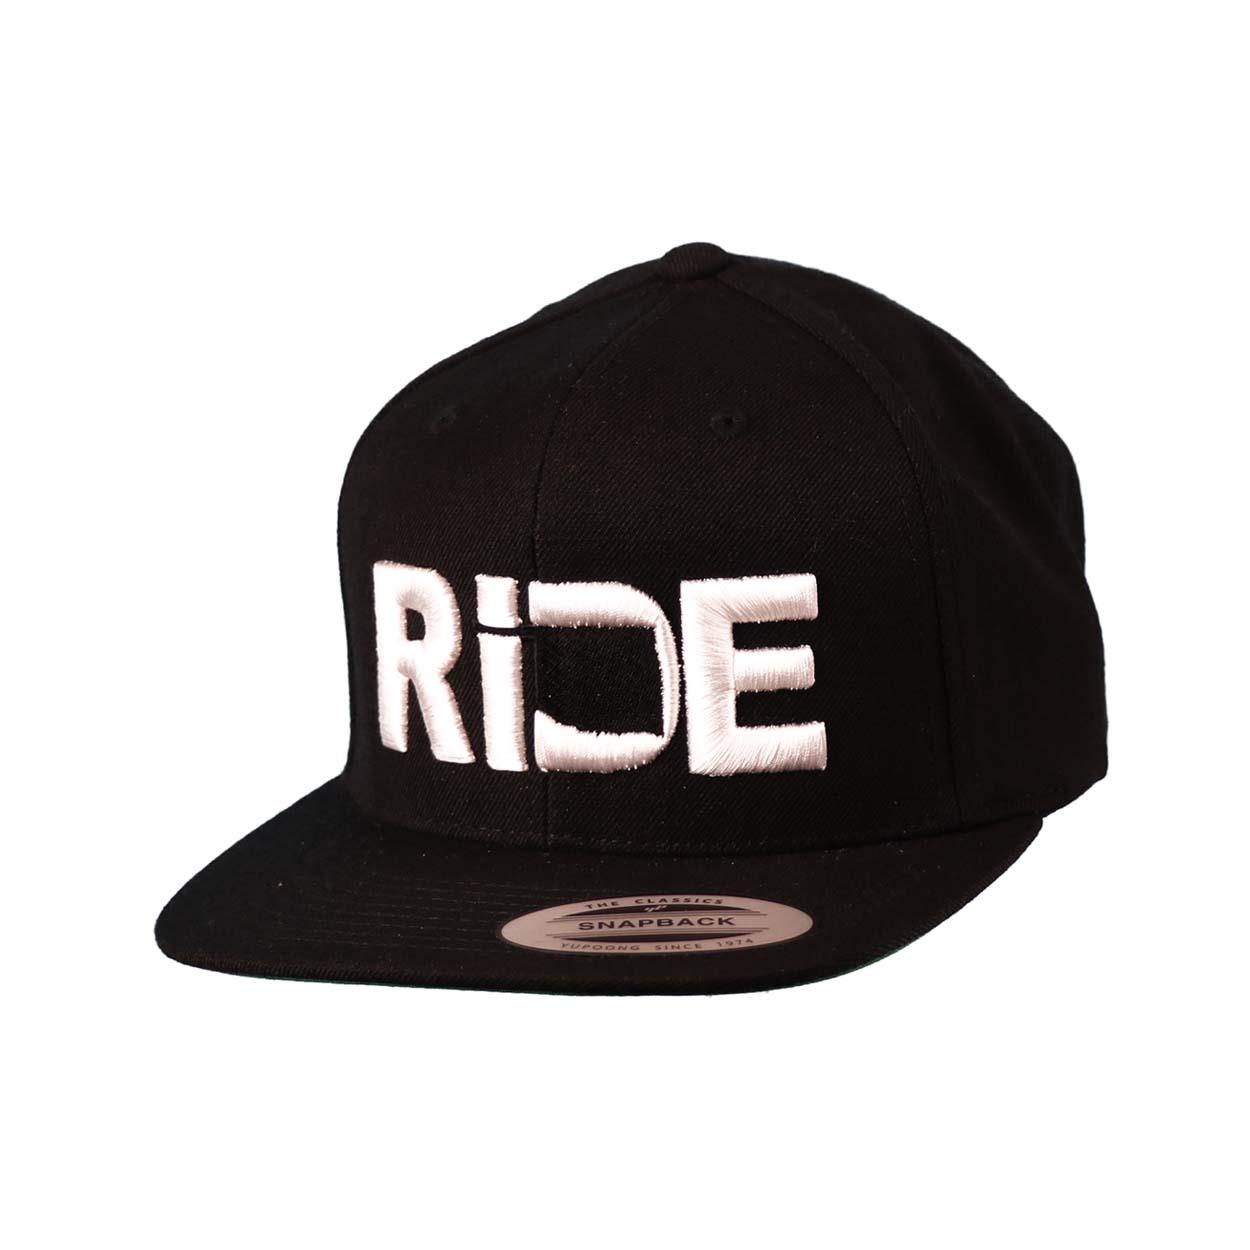 Ride Oklahoma Classic Embroidered  Snapback Flat Brim Hat Black/White